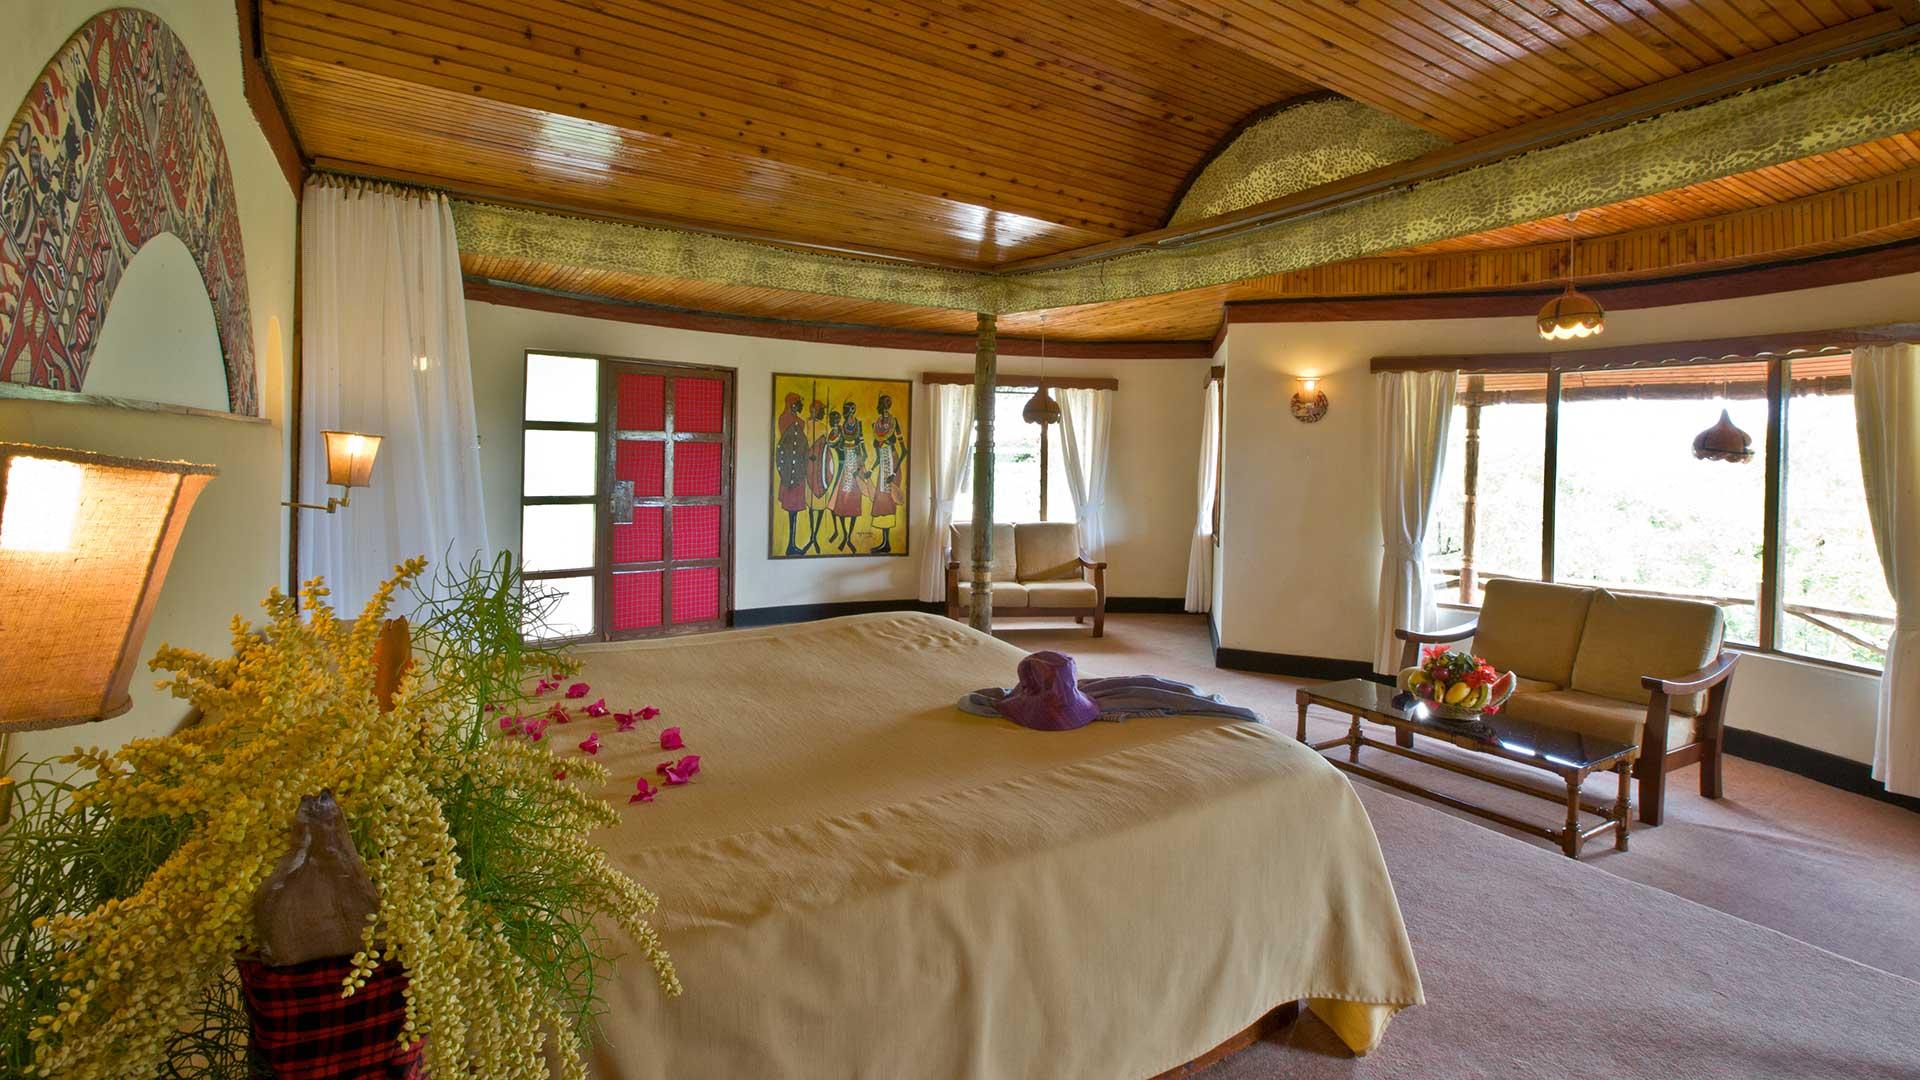 Day 4: Lake Nakuru National Park - Maasai Mara National Reserve